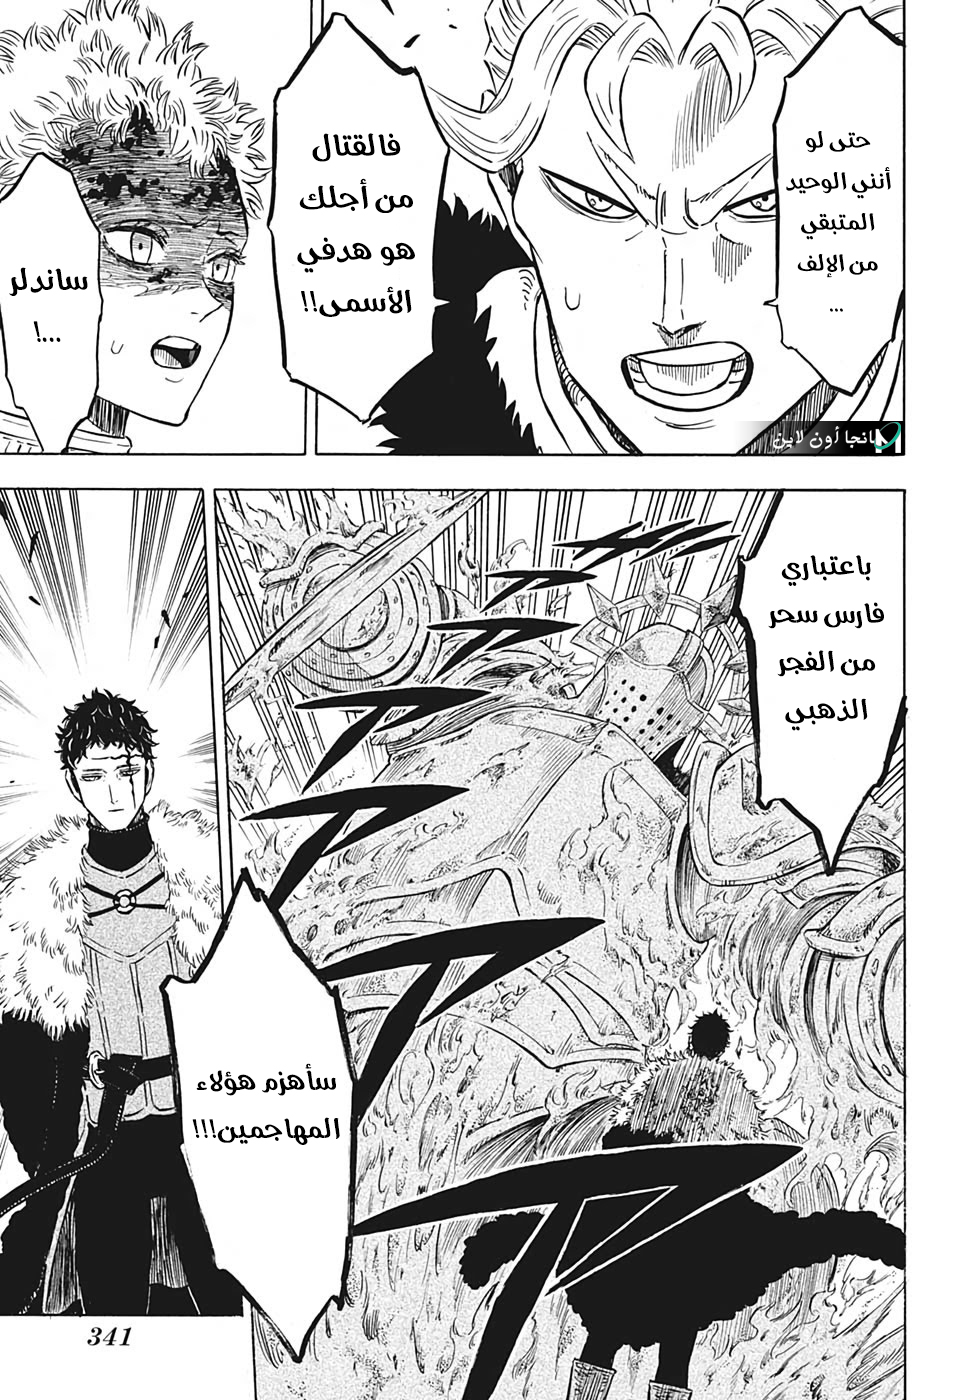 مانجا بلاك كلوفر Manga Black Clover 235 اون لاين - شوف ...